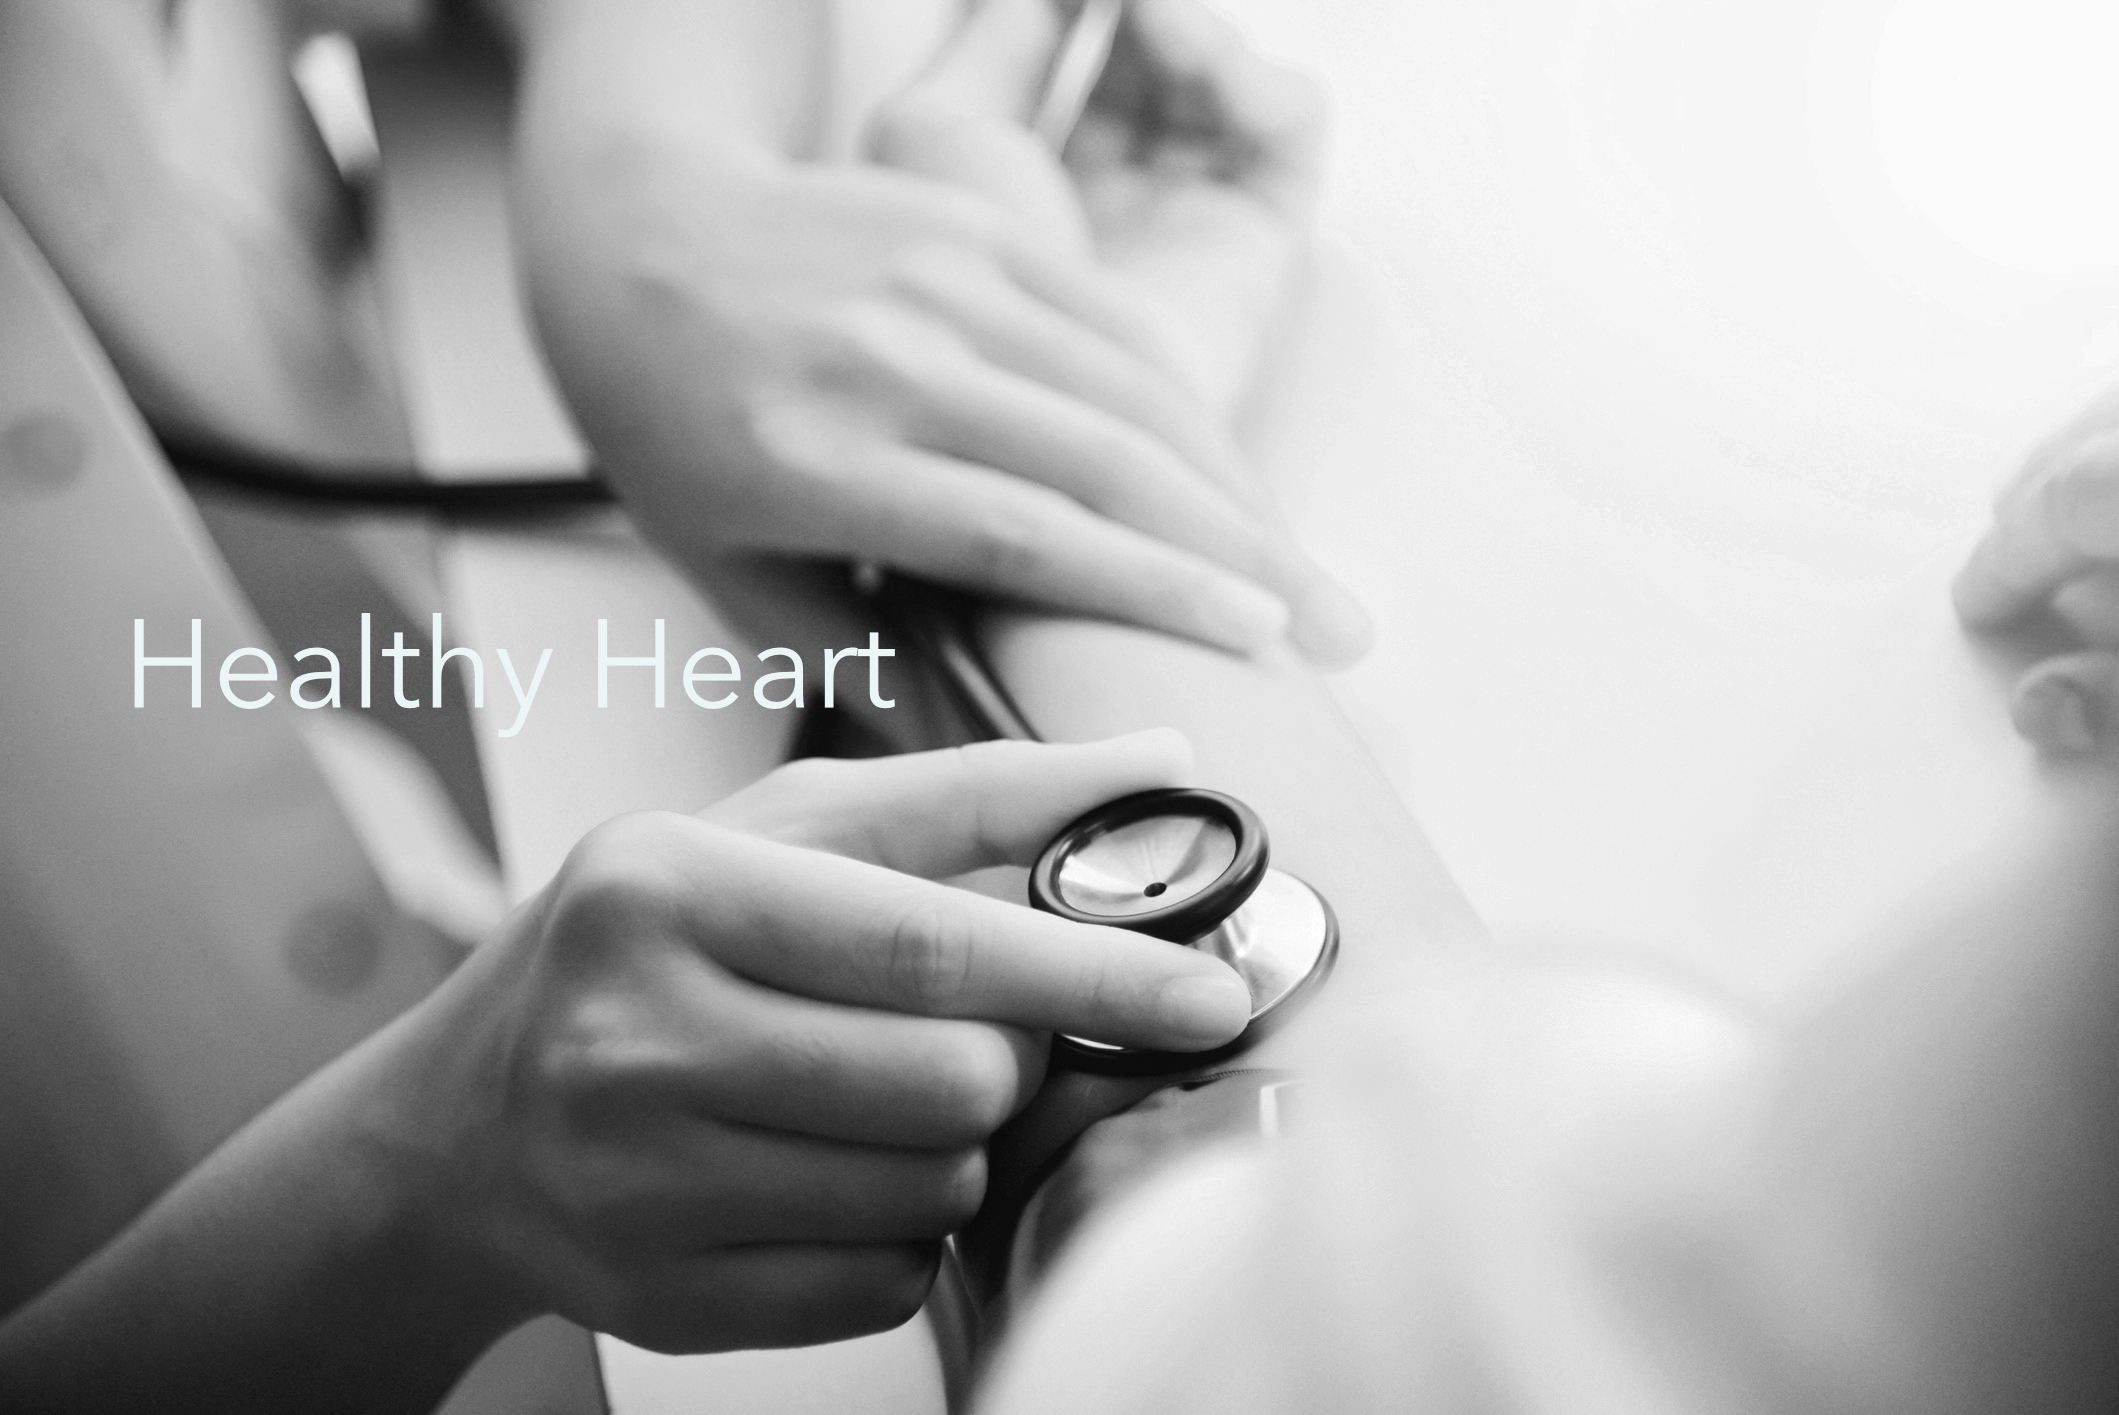 iStock-905360866 Healthy Heart BW.jpg